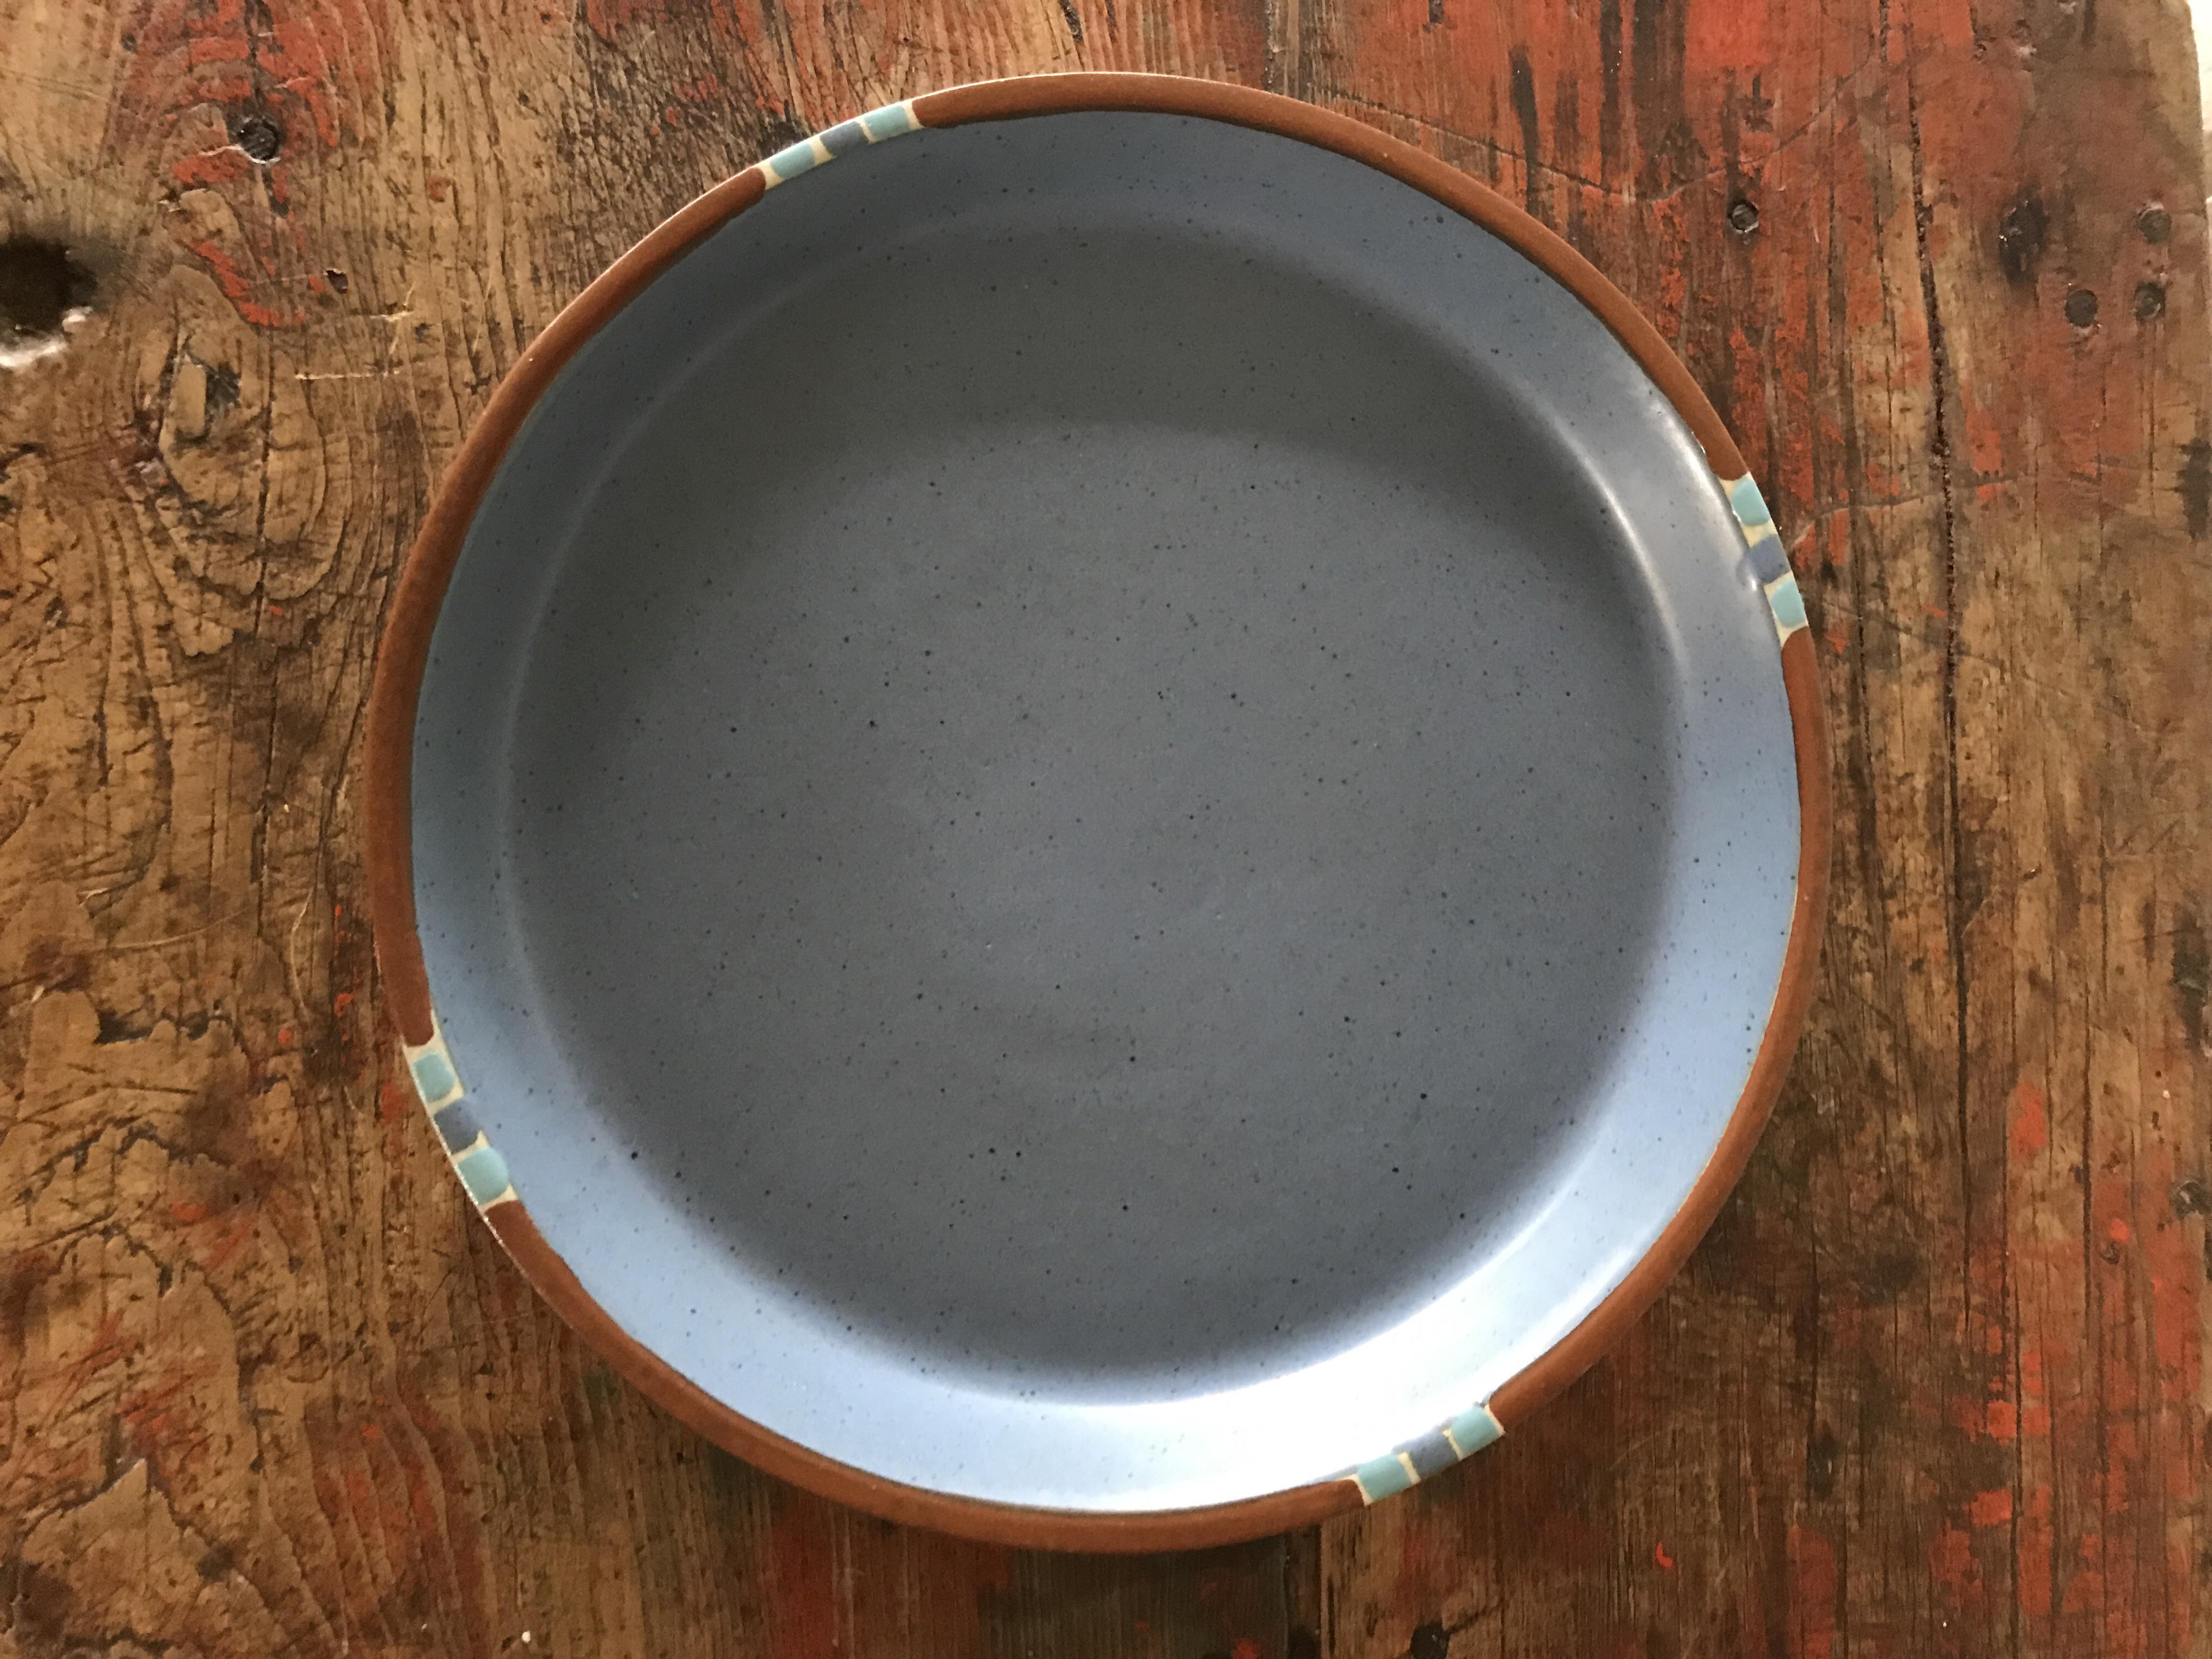 Dansk Mesa Blue Dinner Plates - Set of 4 - Image 3 of 7  sc 1 st  Chairish & Dansk Mesa Blue Dinner Plates - Set of 4 | Chairish